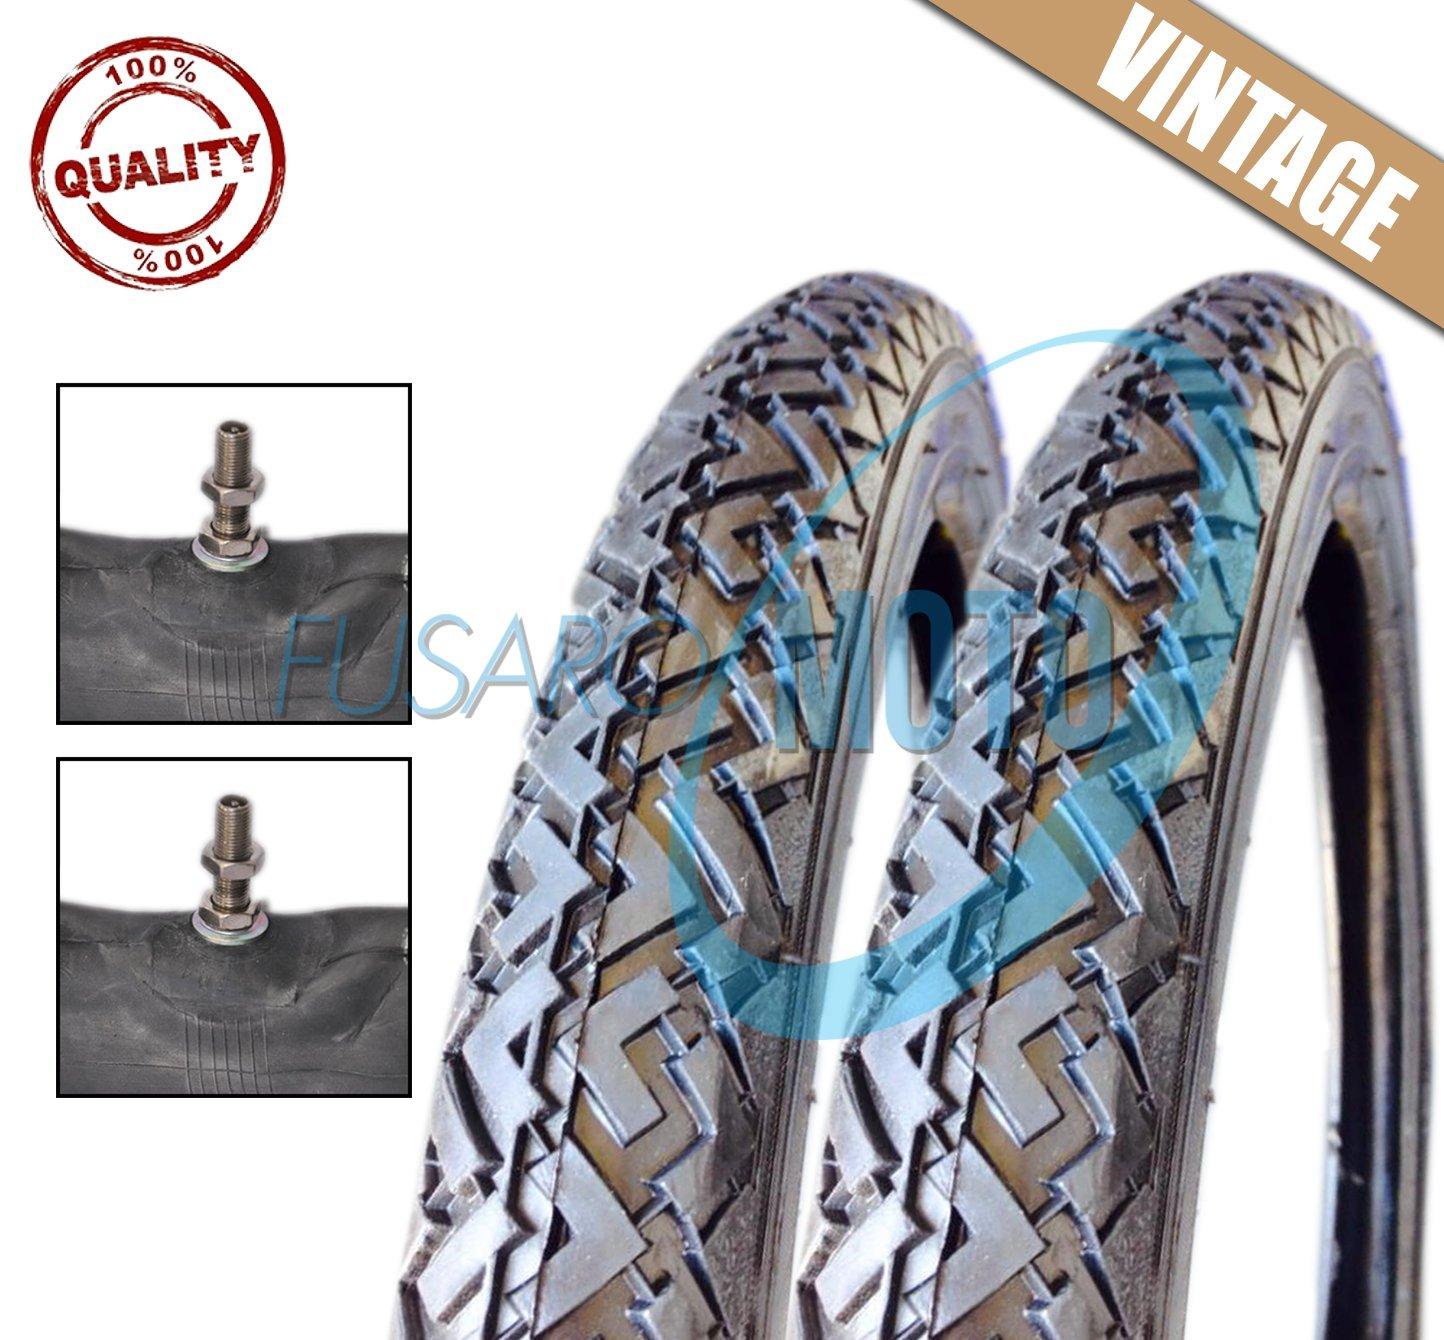 2 Tyres Wheels Tyres Erasers 2 –  17 + 2 Air Chambers Moto Piaggio Ciao FUSARORICAMBI